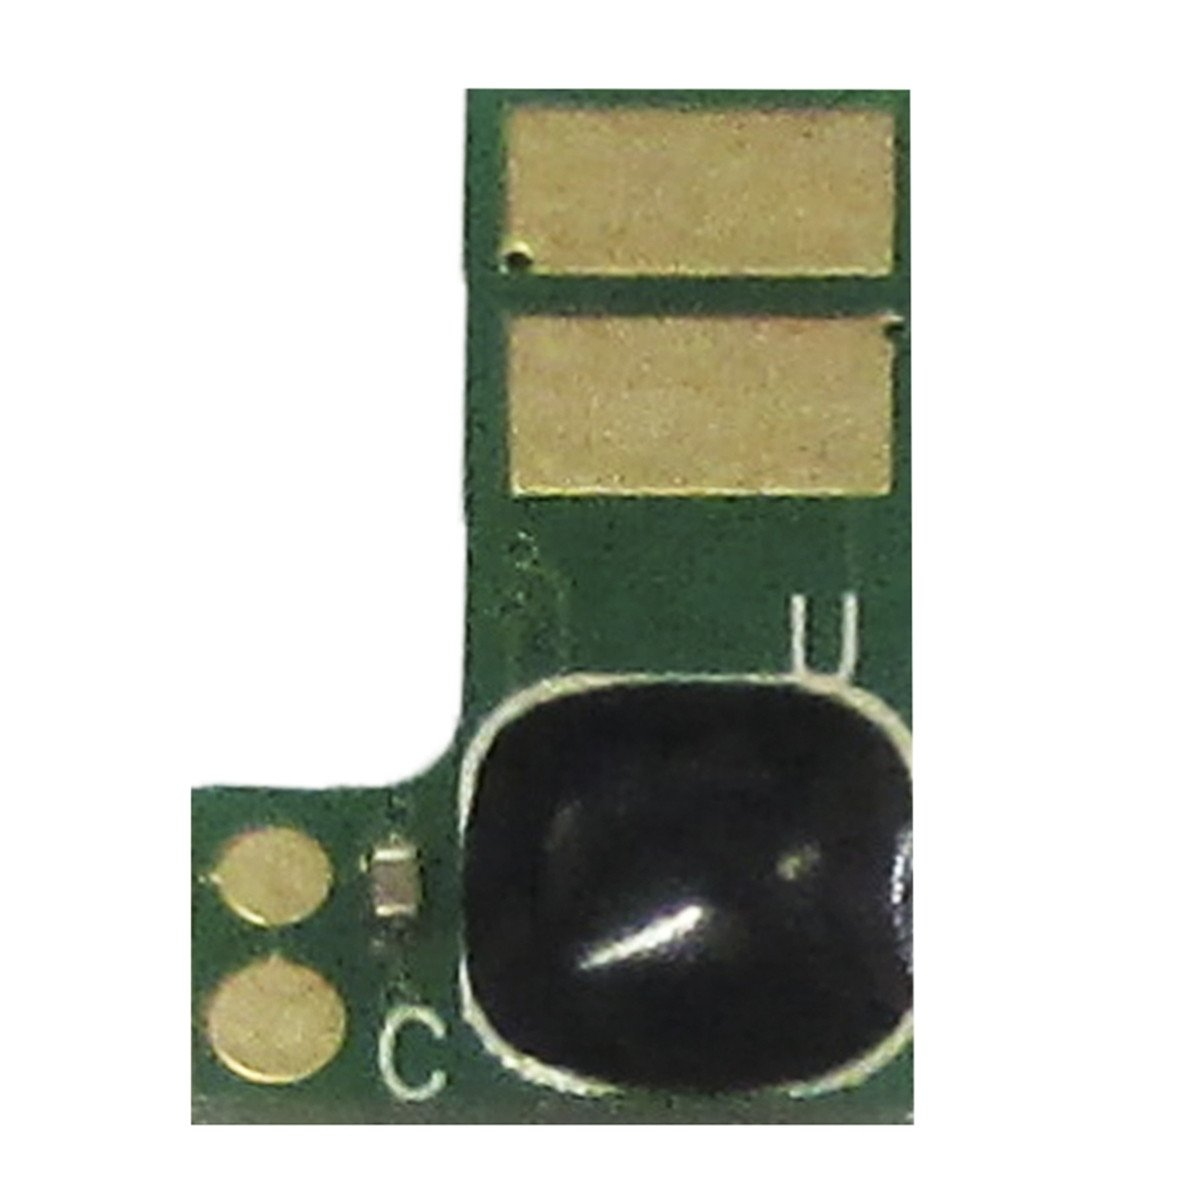 Chip CF217A M130 M102 M130A M102A M102W M130FN M130FW M130NW